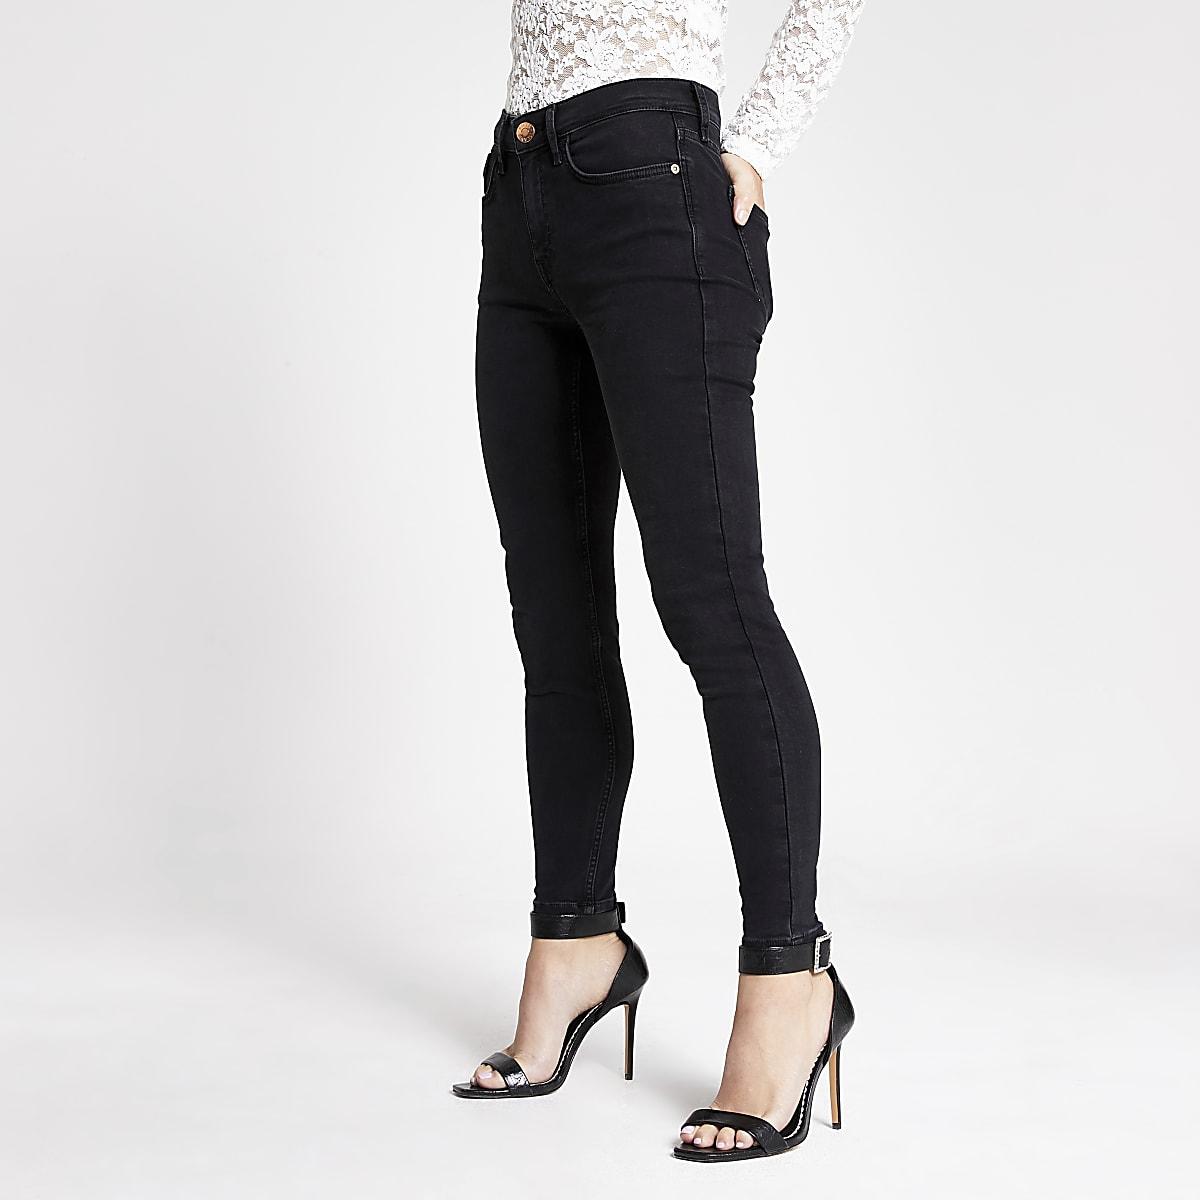 RI Petite - Amelie - Zwarte superskinny jeans